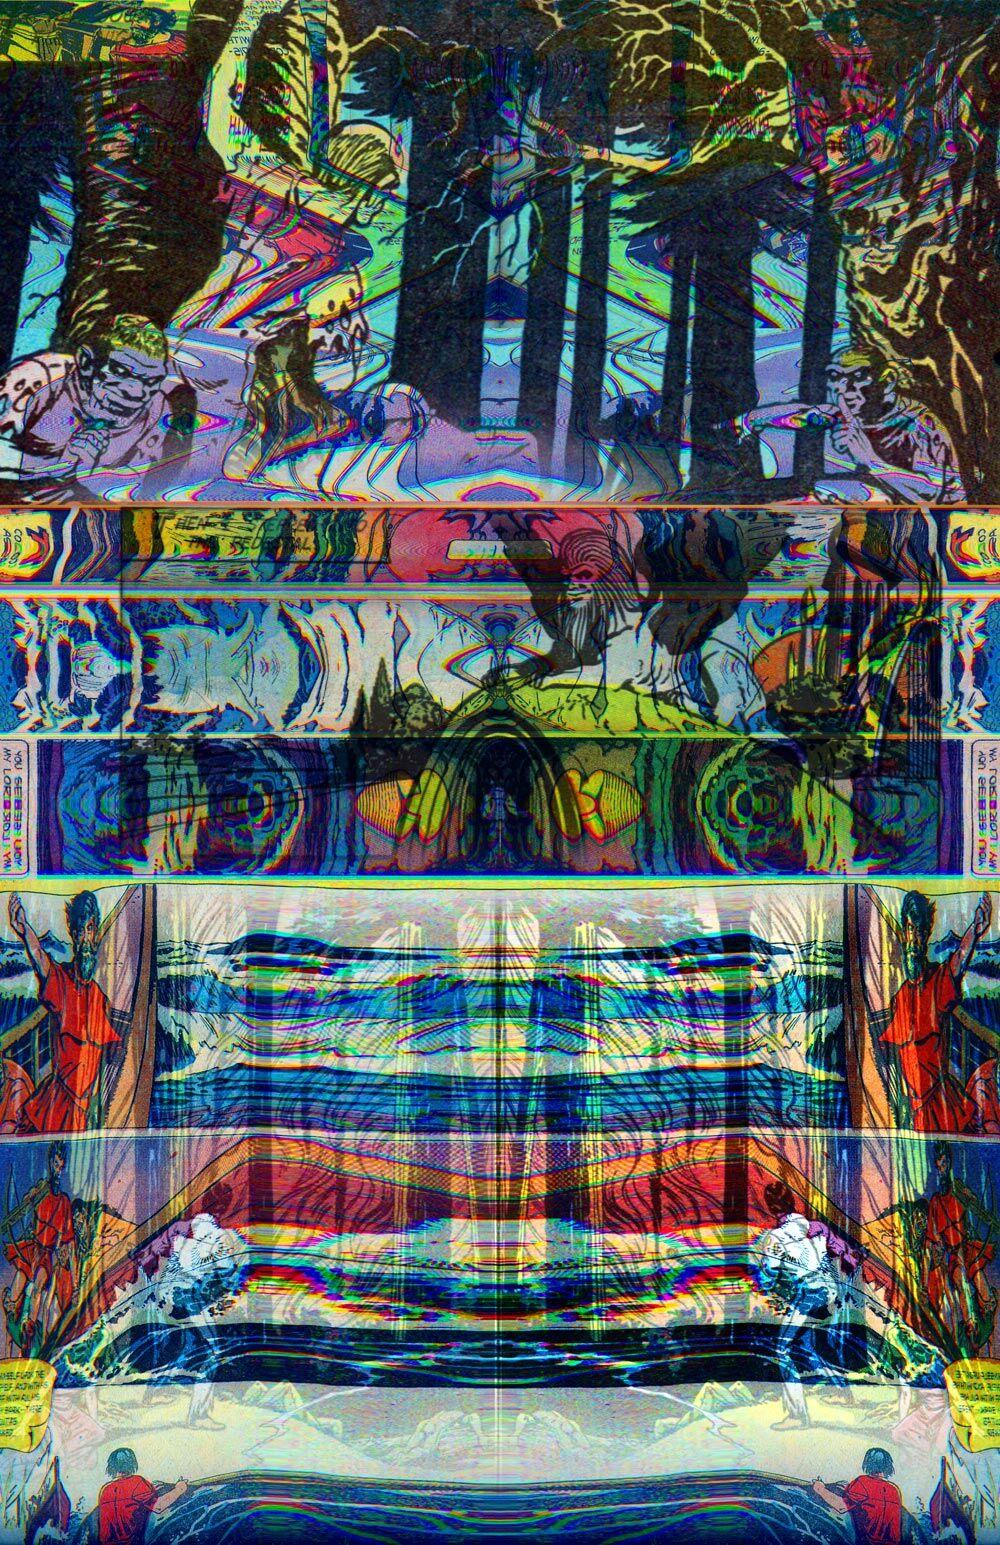 TUNES-Art from thefacesblur website (4).jpg